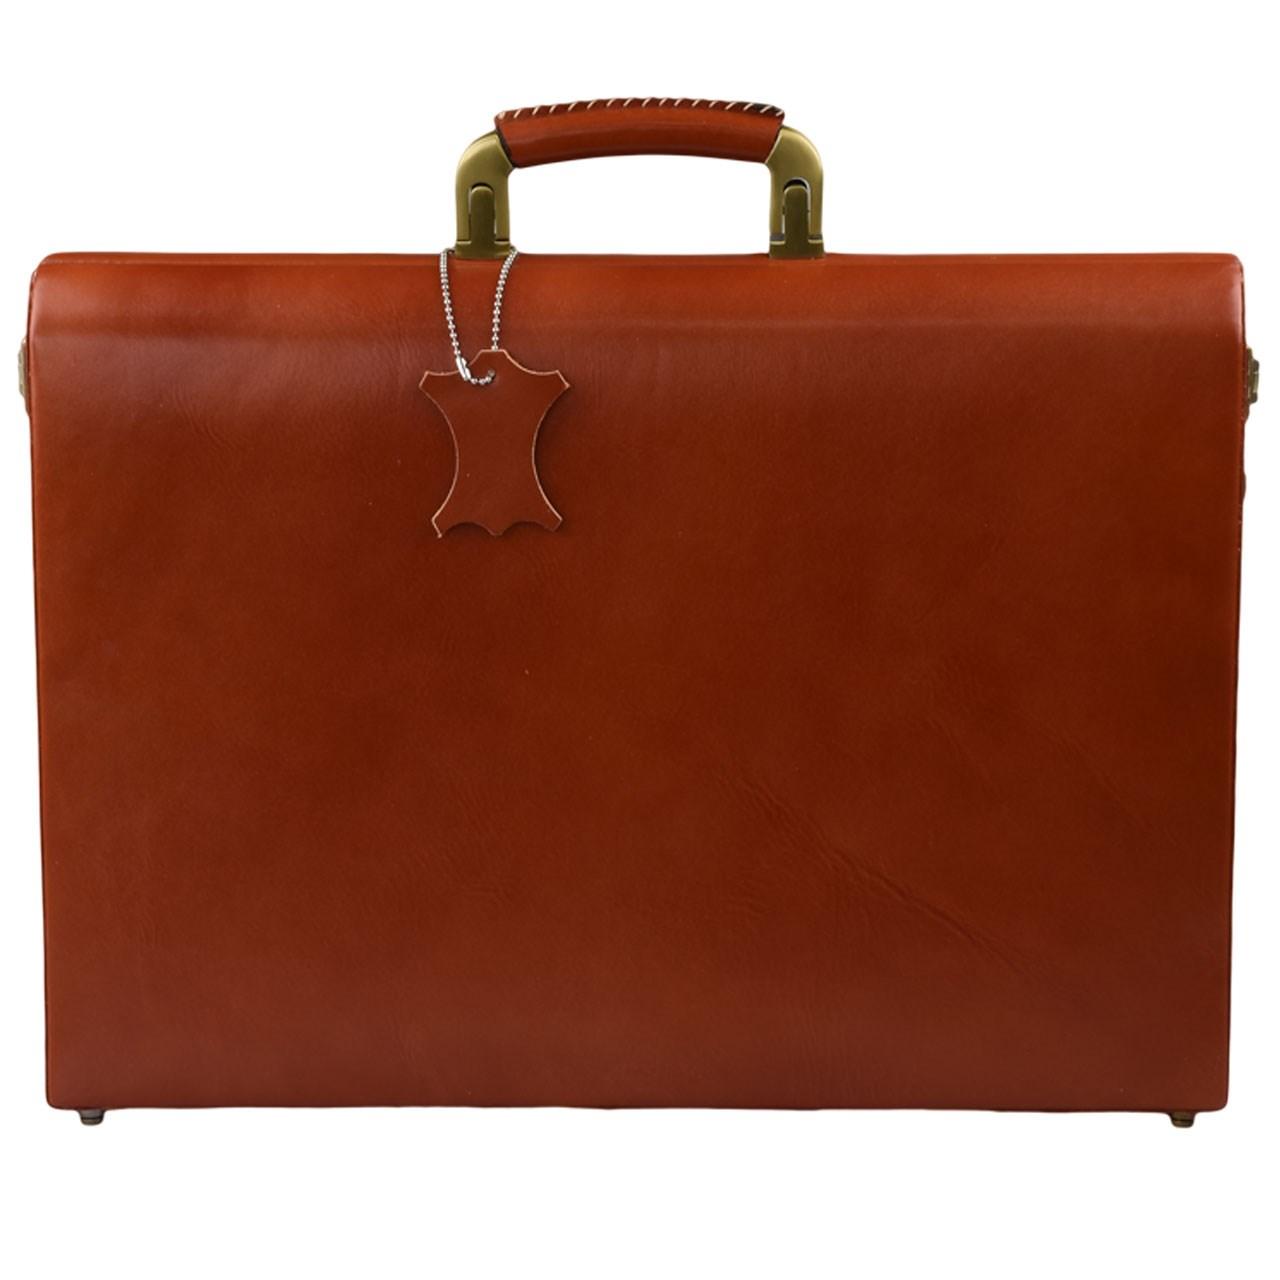 کیف اداری چرم طبیعی کهن چرم مدل L76-1